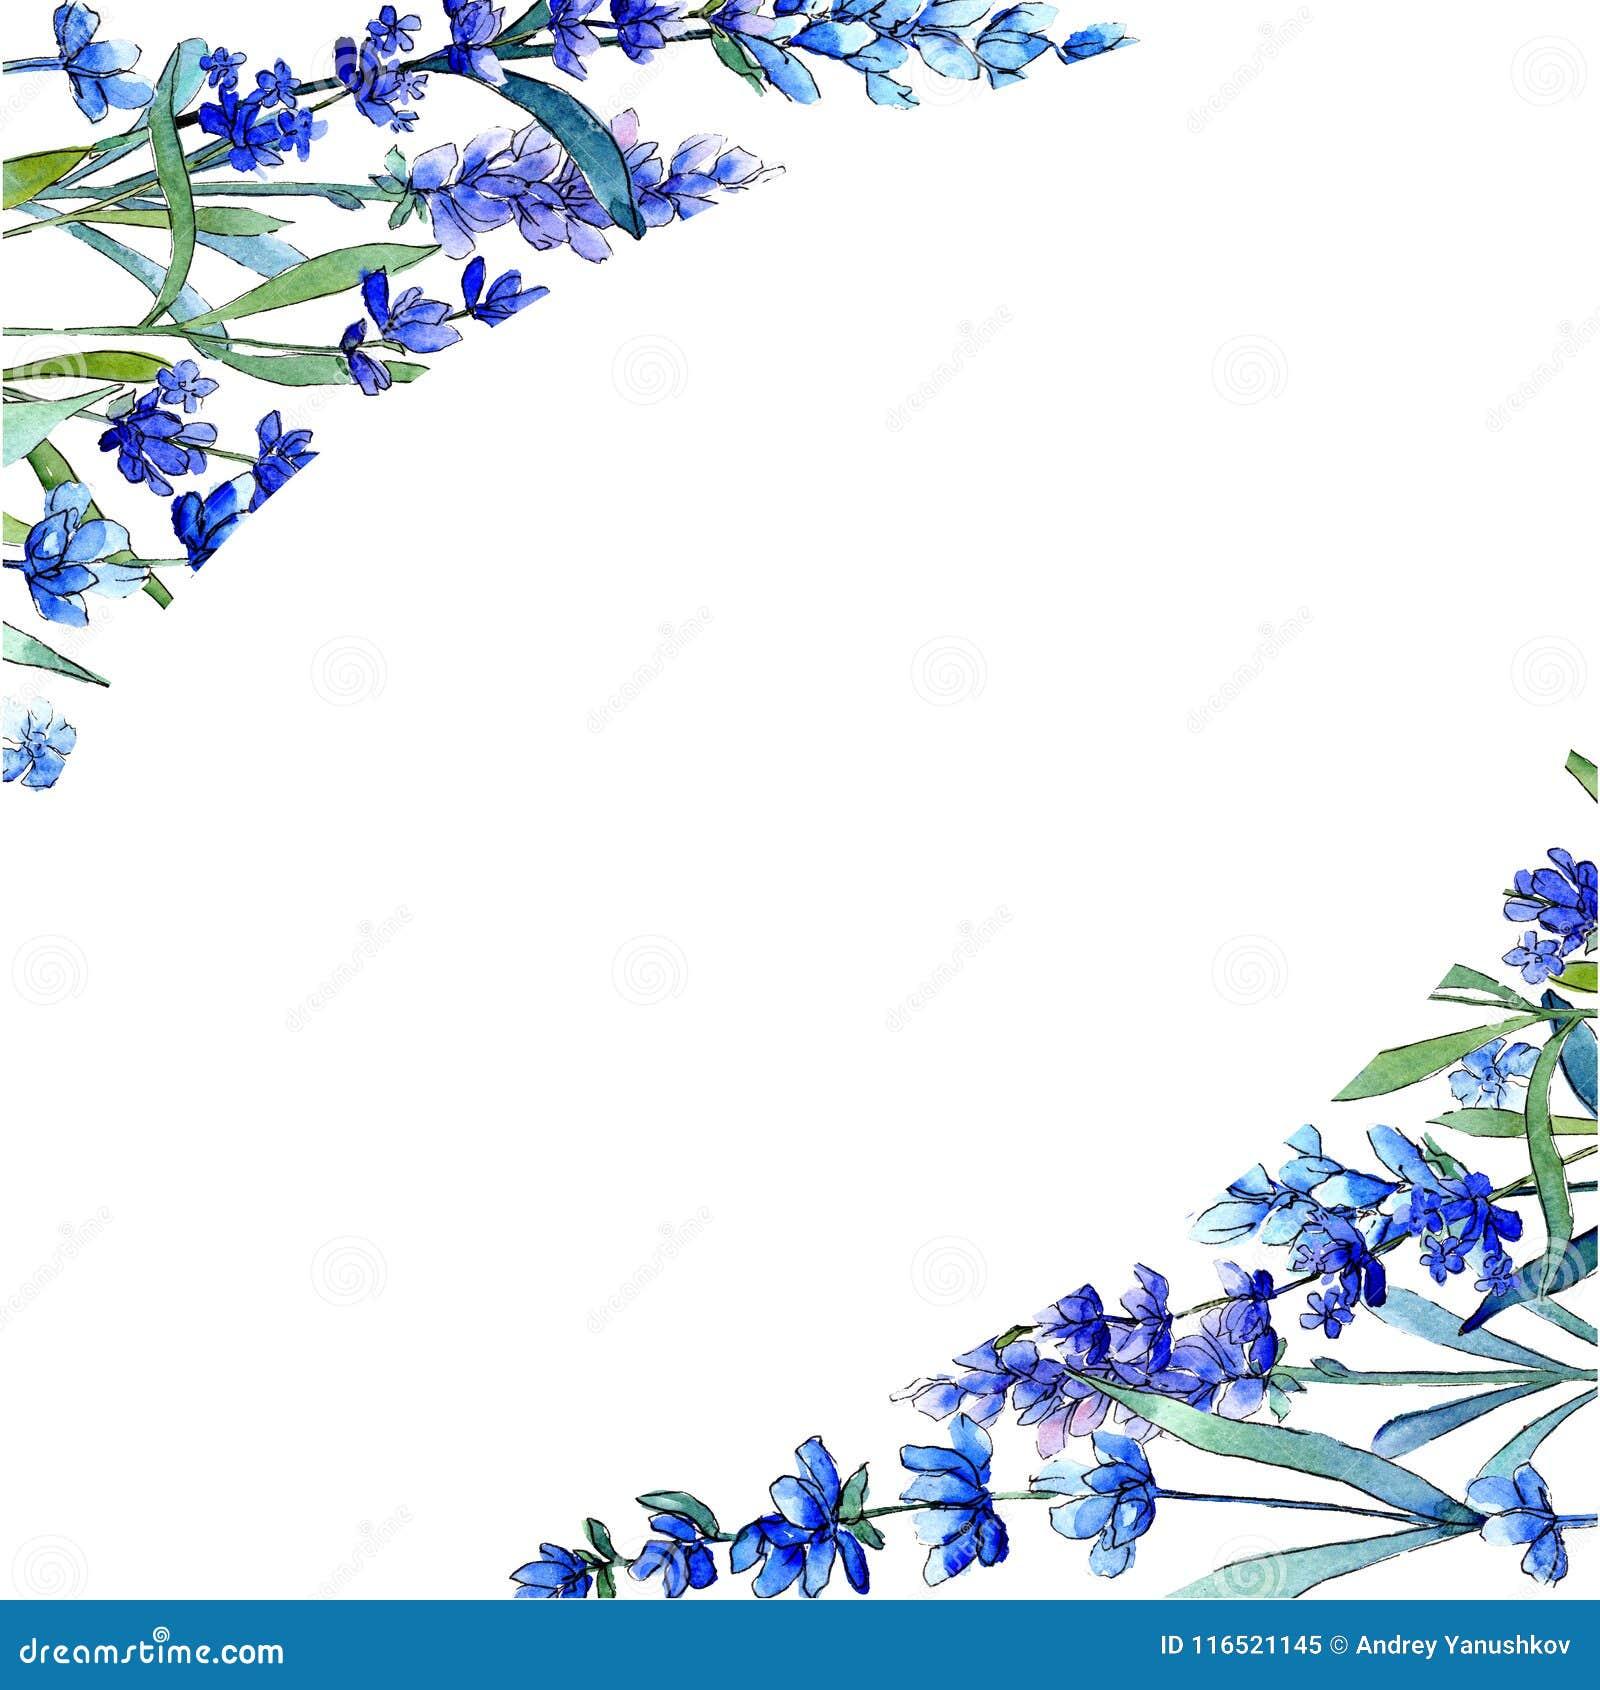 Blue lavender. Floral botanical flower. Wild spring leaf wildflower frame in a watercolor style.